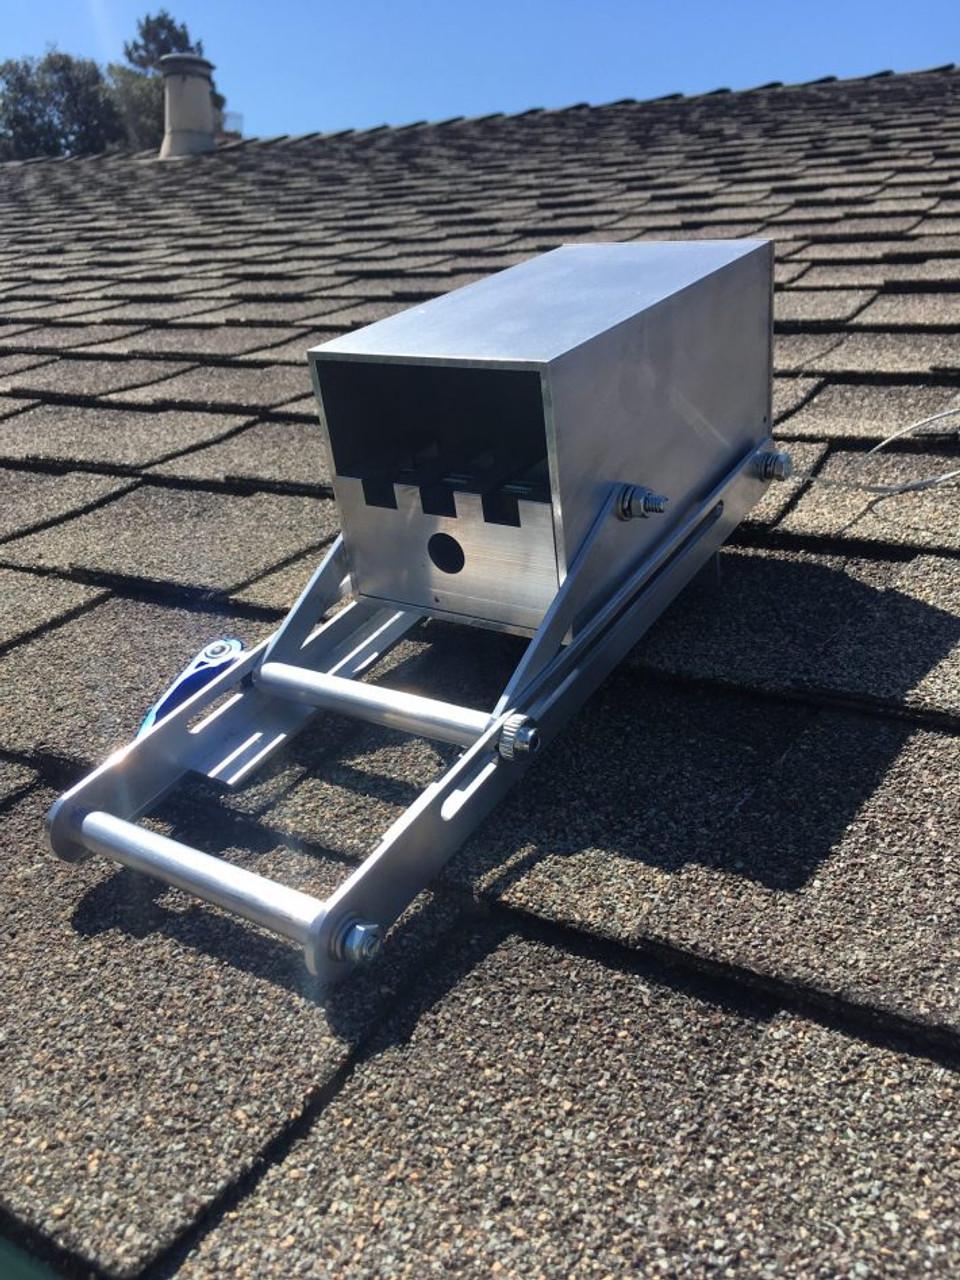 SB100-Portable-Soldering-Furnace-Box-Alassco Online Store